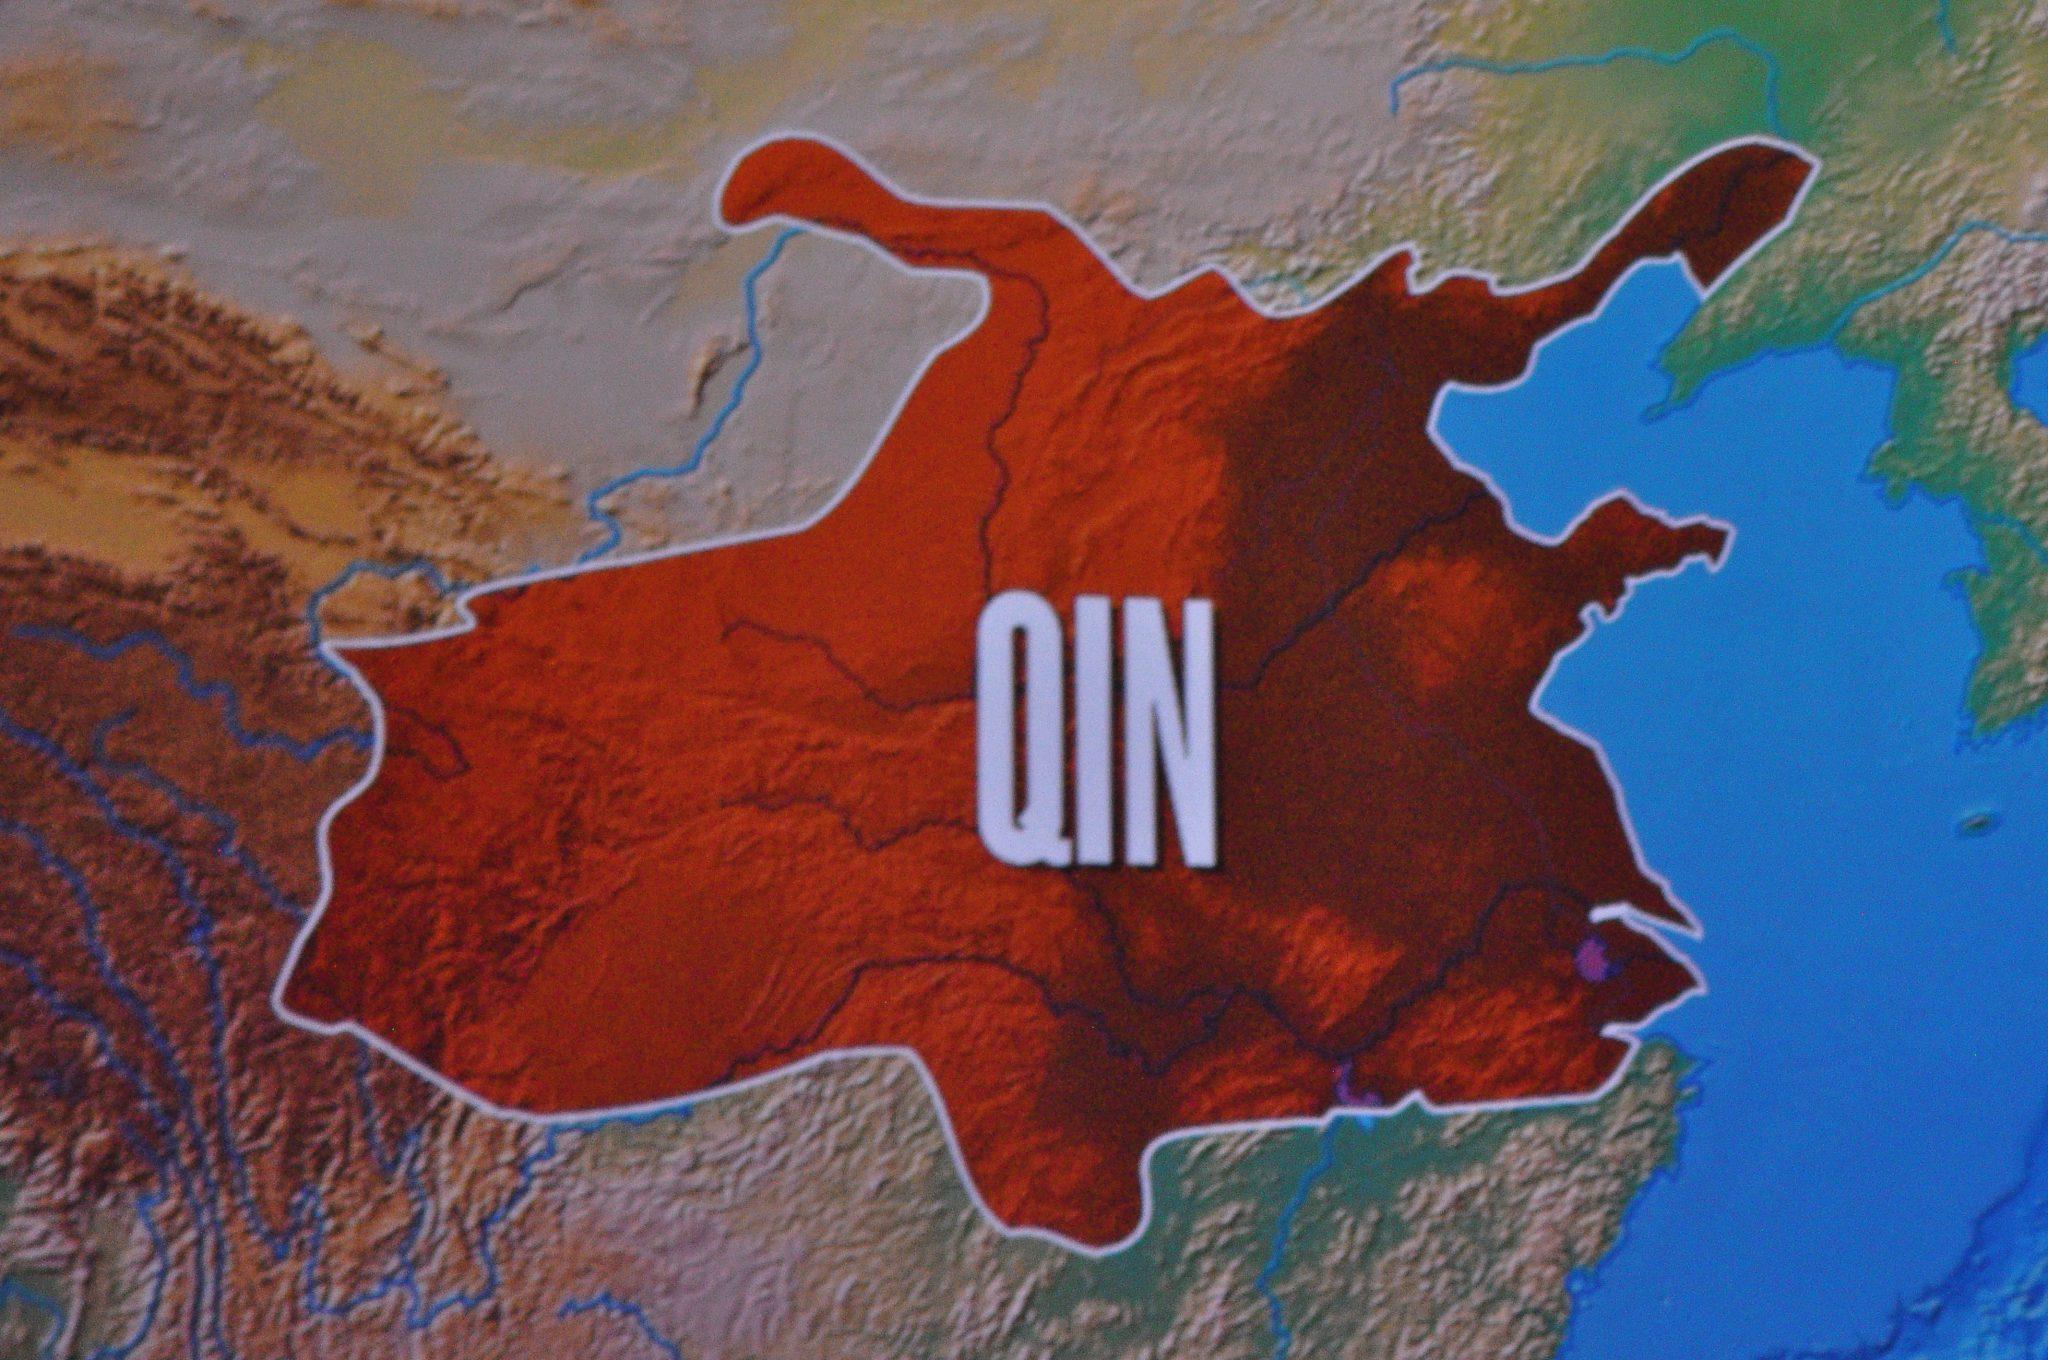 """Qin region"", at the Terracotta Soldiers Exhibit Asian Arts Museum @ Julie Pimentel, 2013, CC BY-NC 2.0"